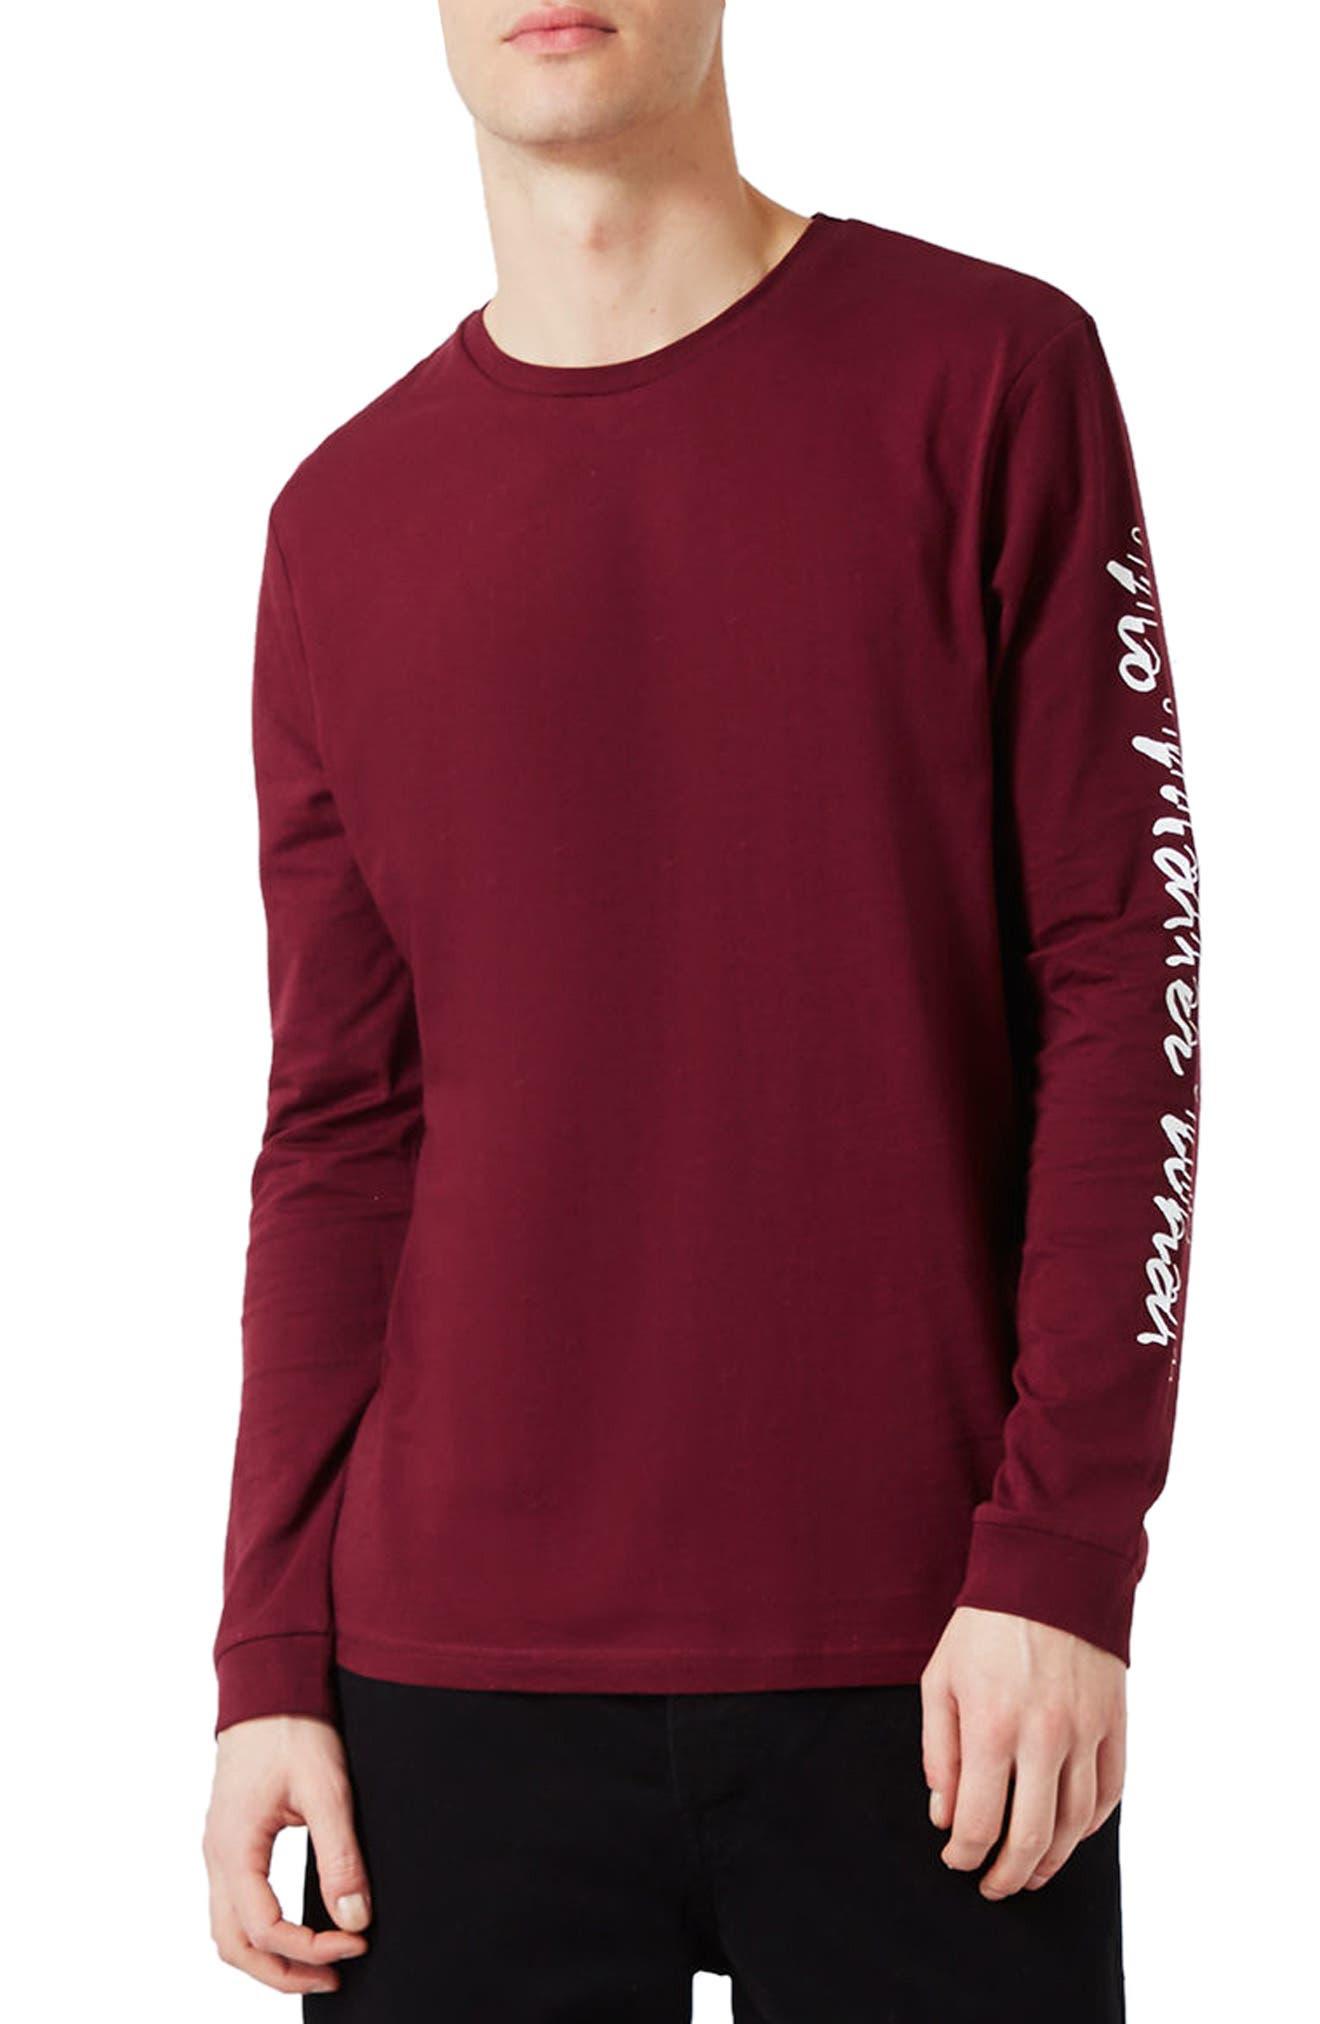 Topman No Matter What Graphic T-Shirt